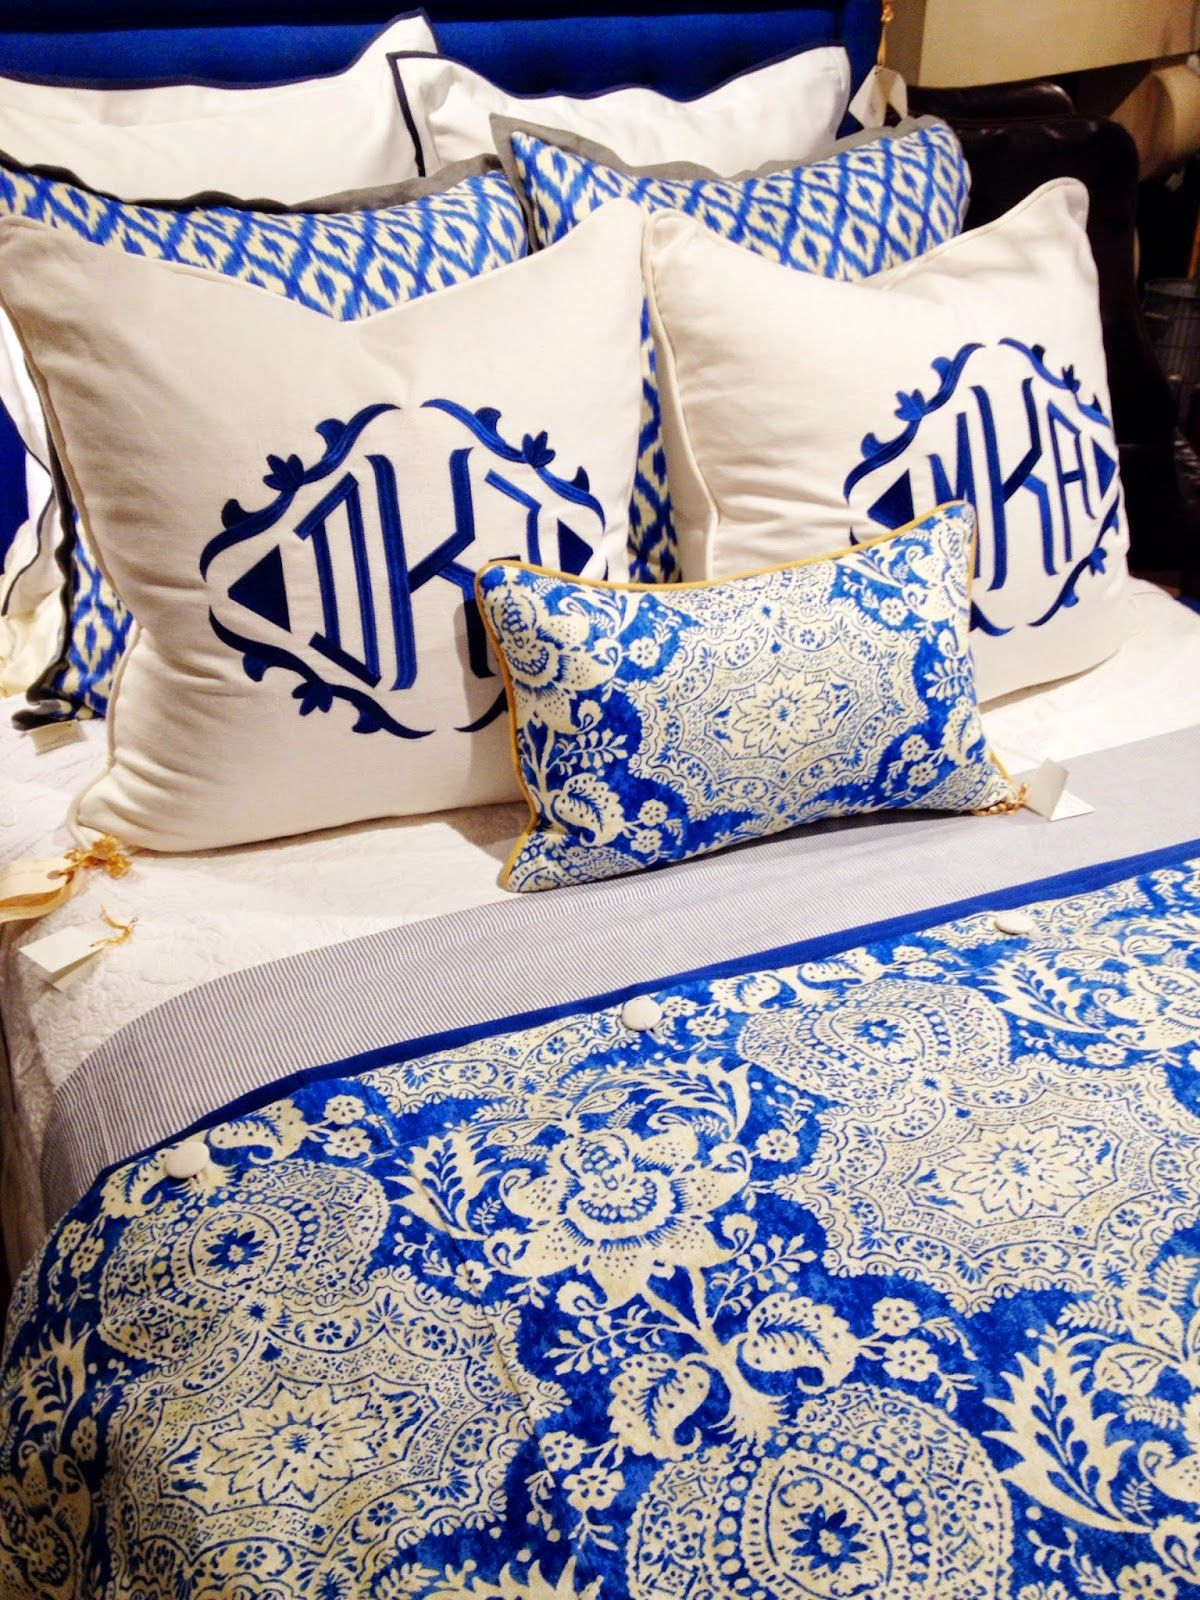 chinoiserie bedding  chinoiserie  pinterest  carolinablues  - chinoiserie bedding